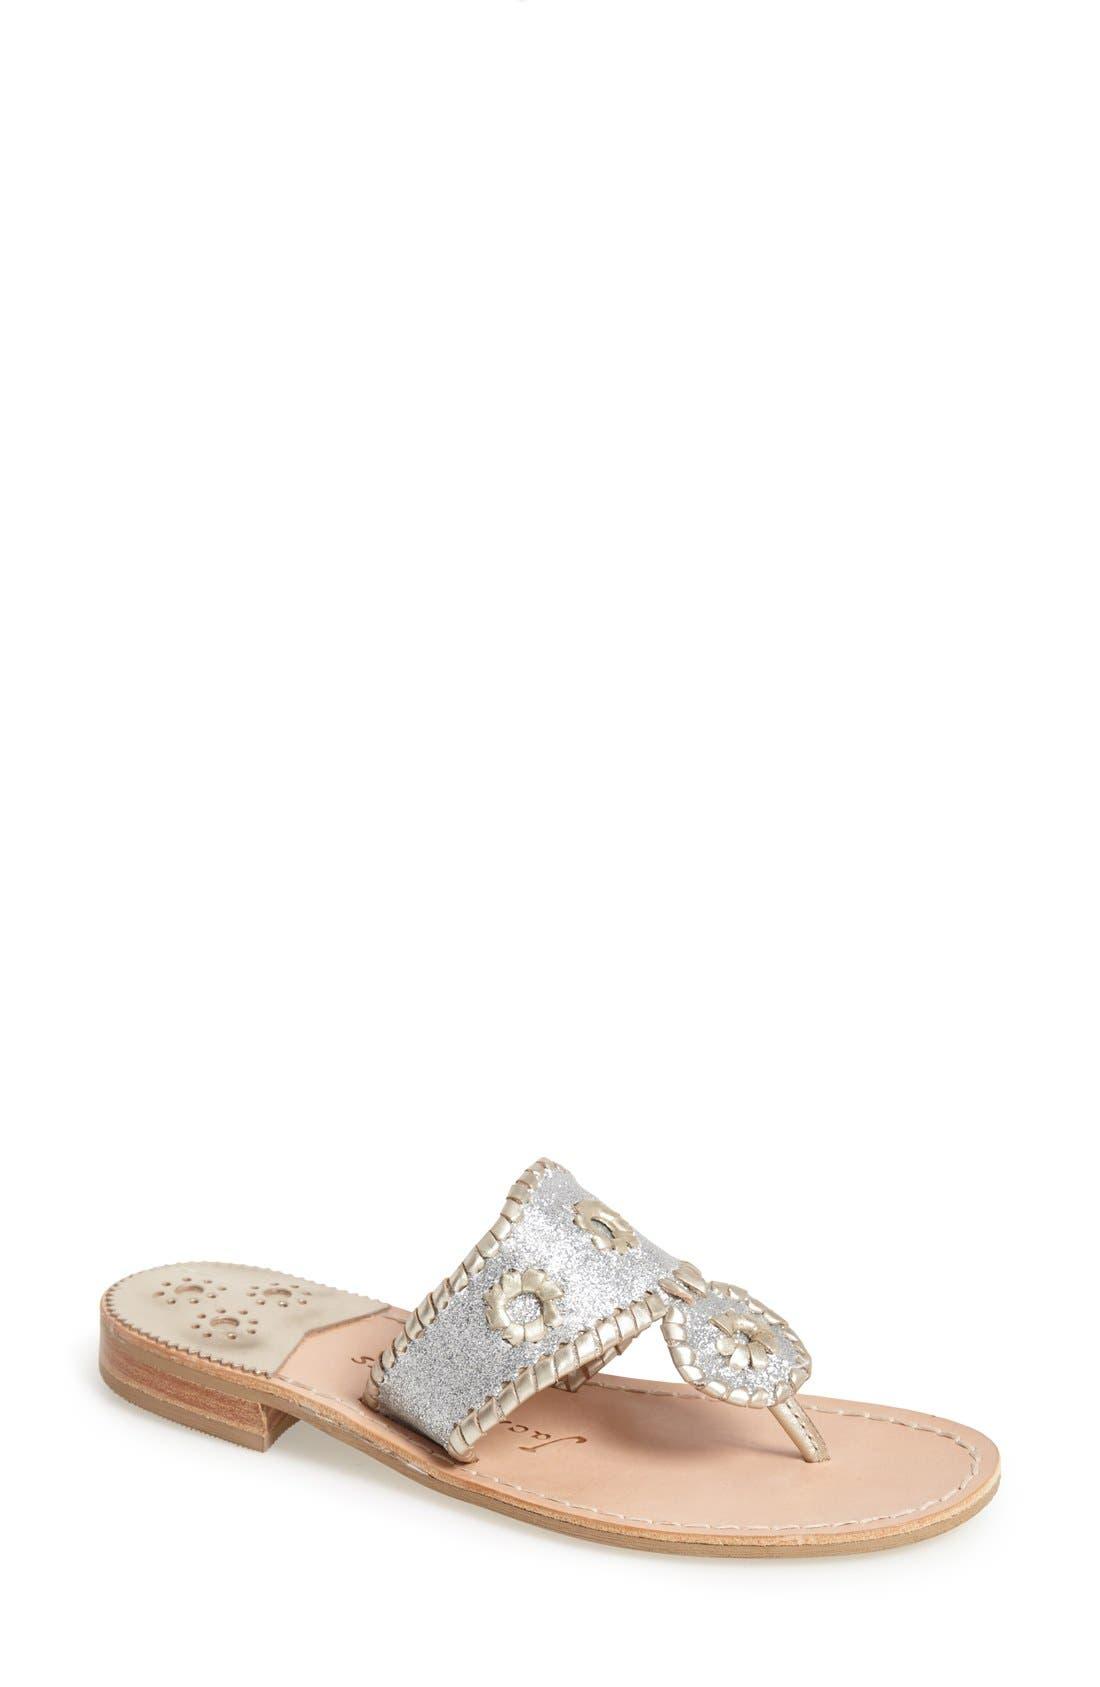 Main Image - Jack Rogers 'Sparkle' Sandal (Women)